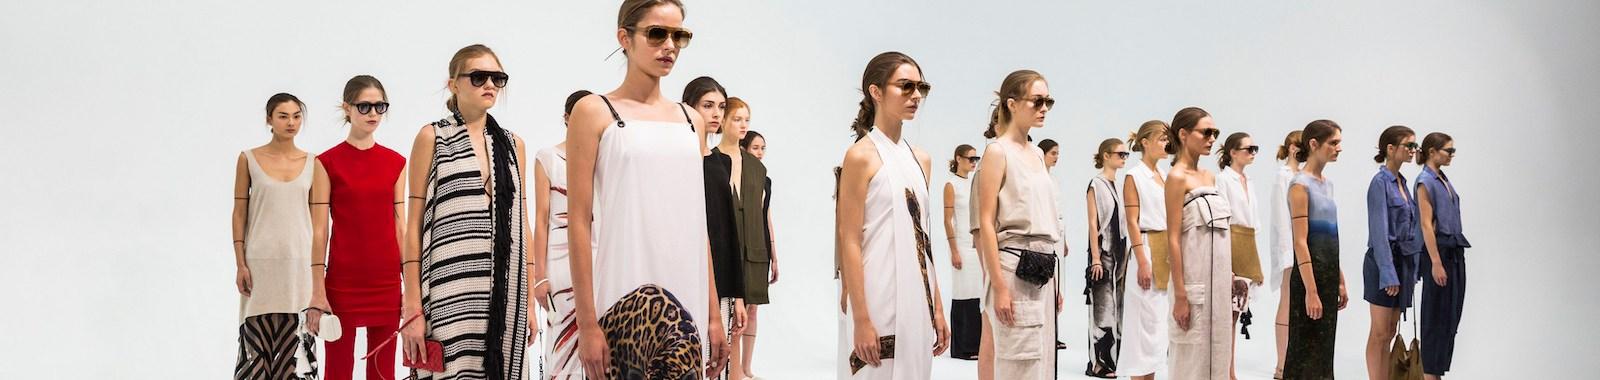 NY fashion week eyecatch